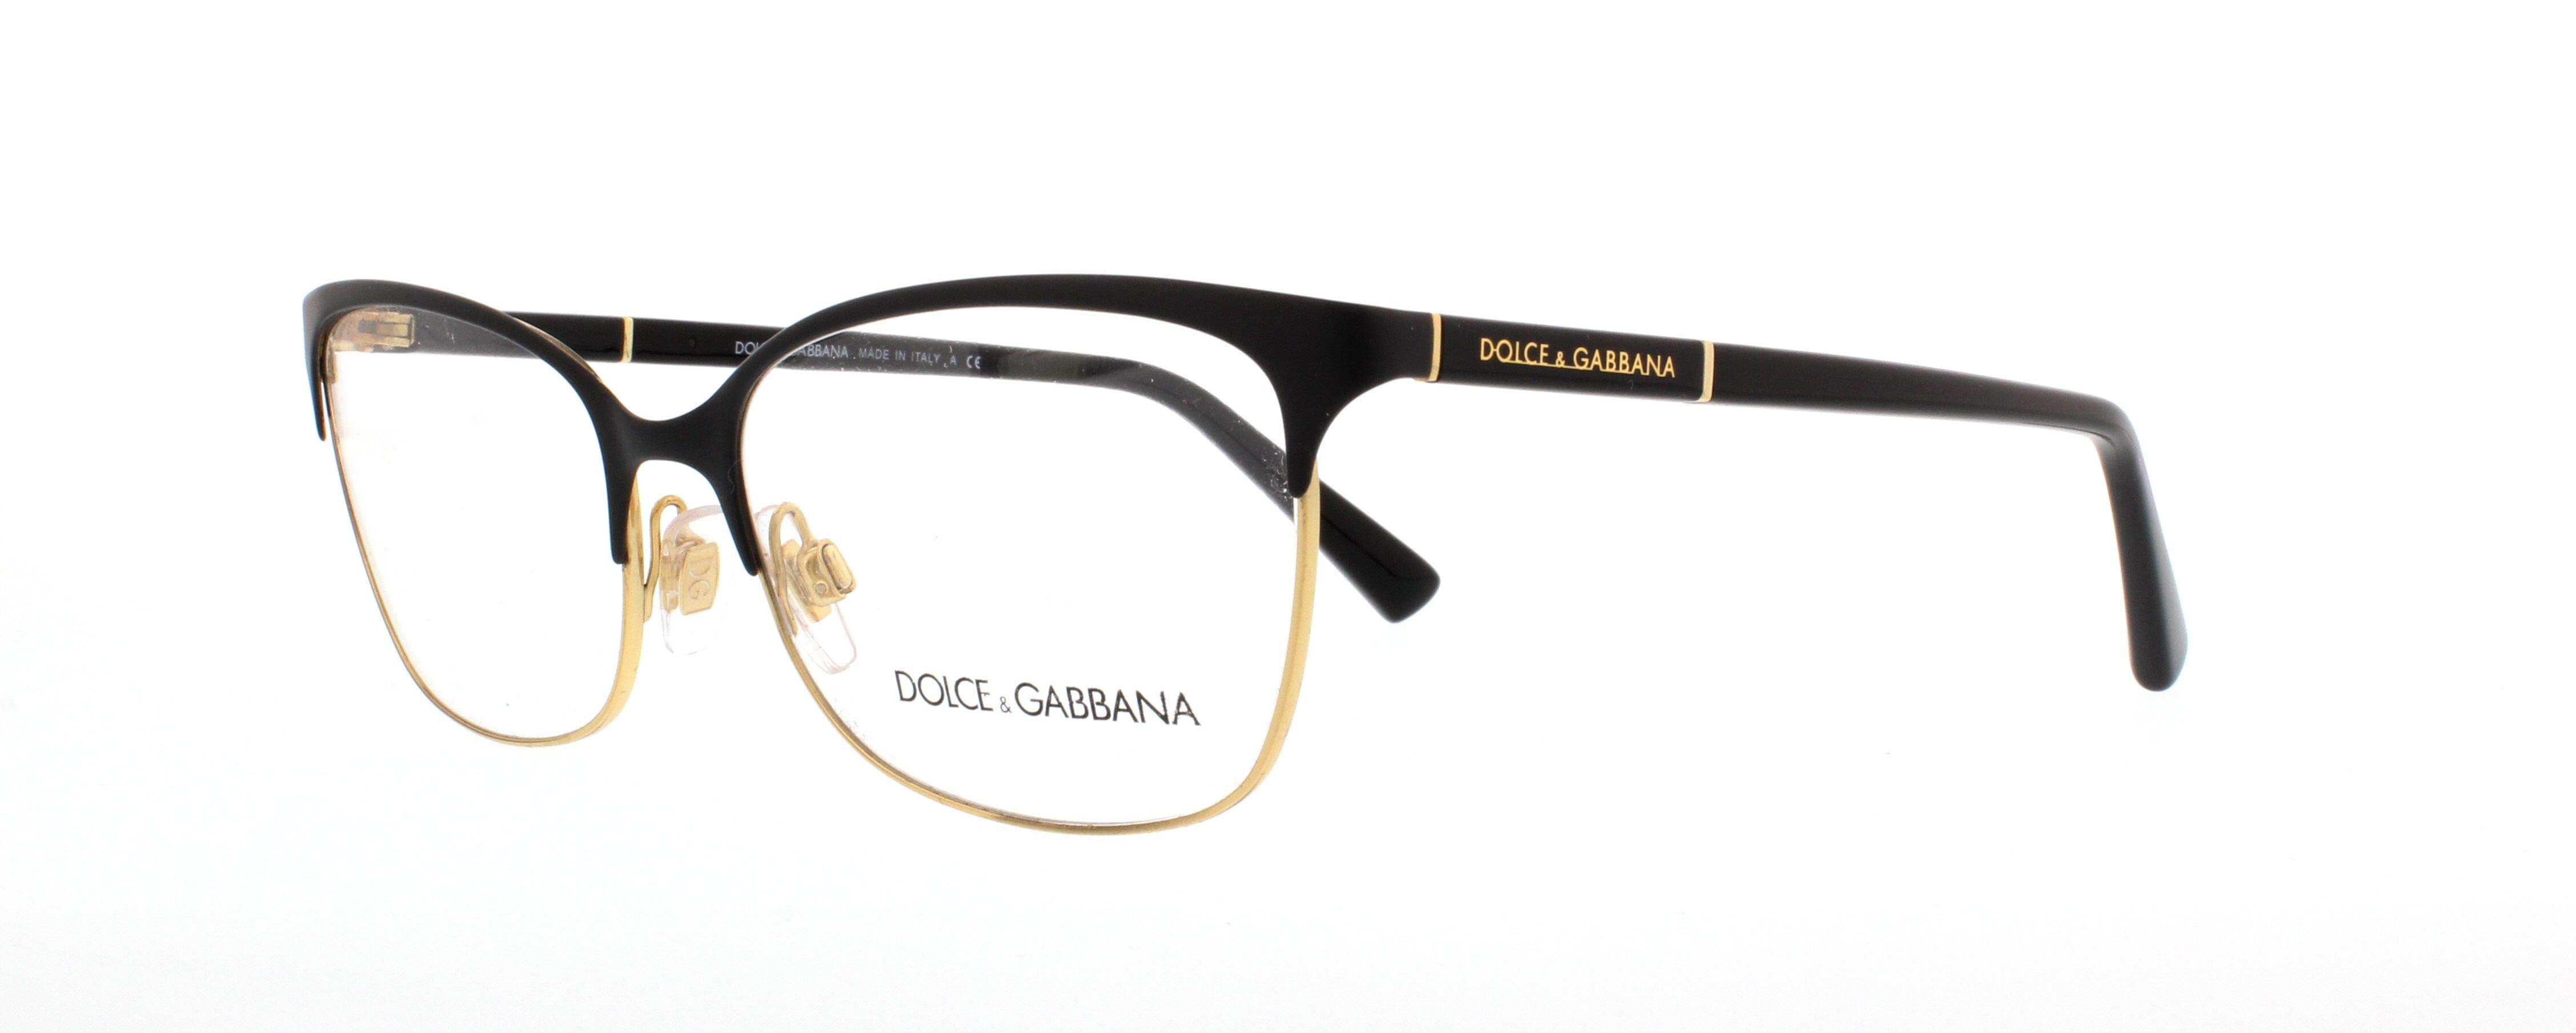 dolce gabbana eyeglasses dg1268 025 black gold 54mm walmartcom - Dolce And Gabbana Eyeglass Frames